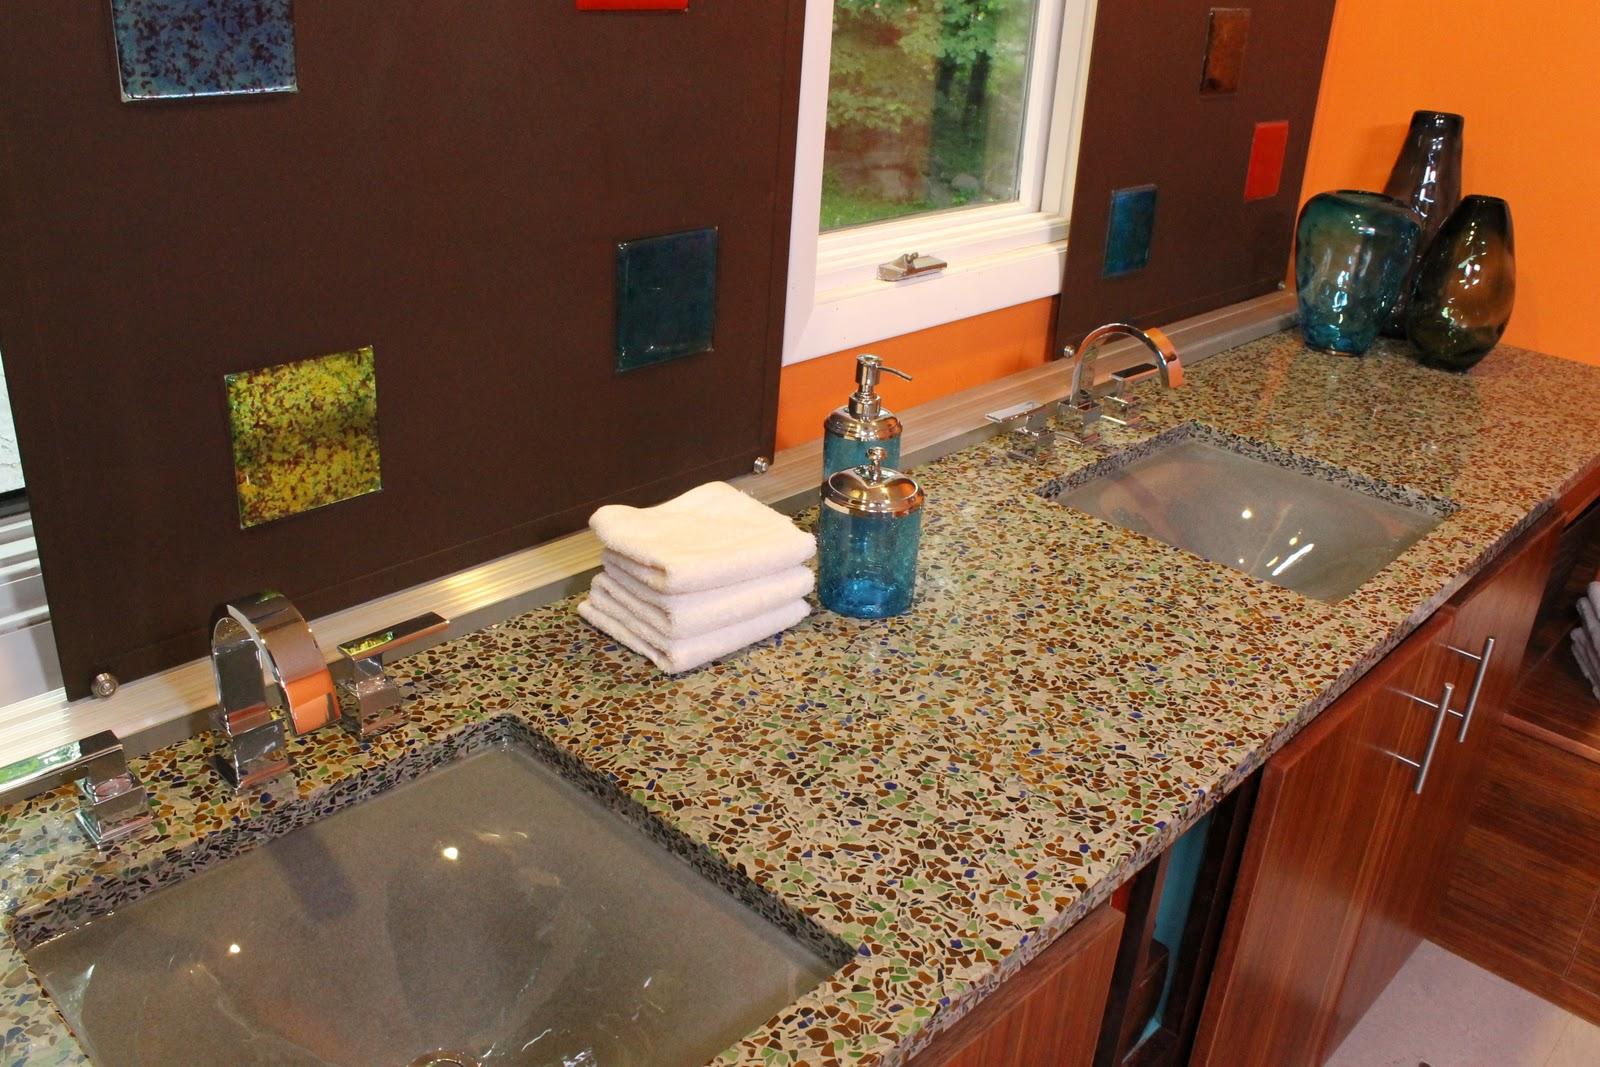 Diy Bathroom Floors Glass Recycleds Diy Bathroom Glass Recycled Surfaces